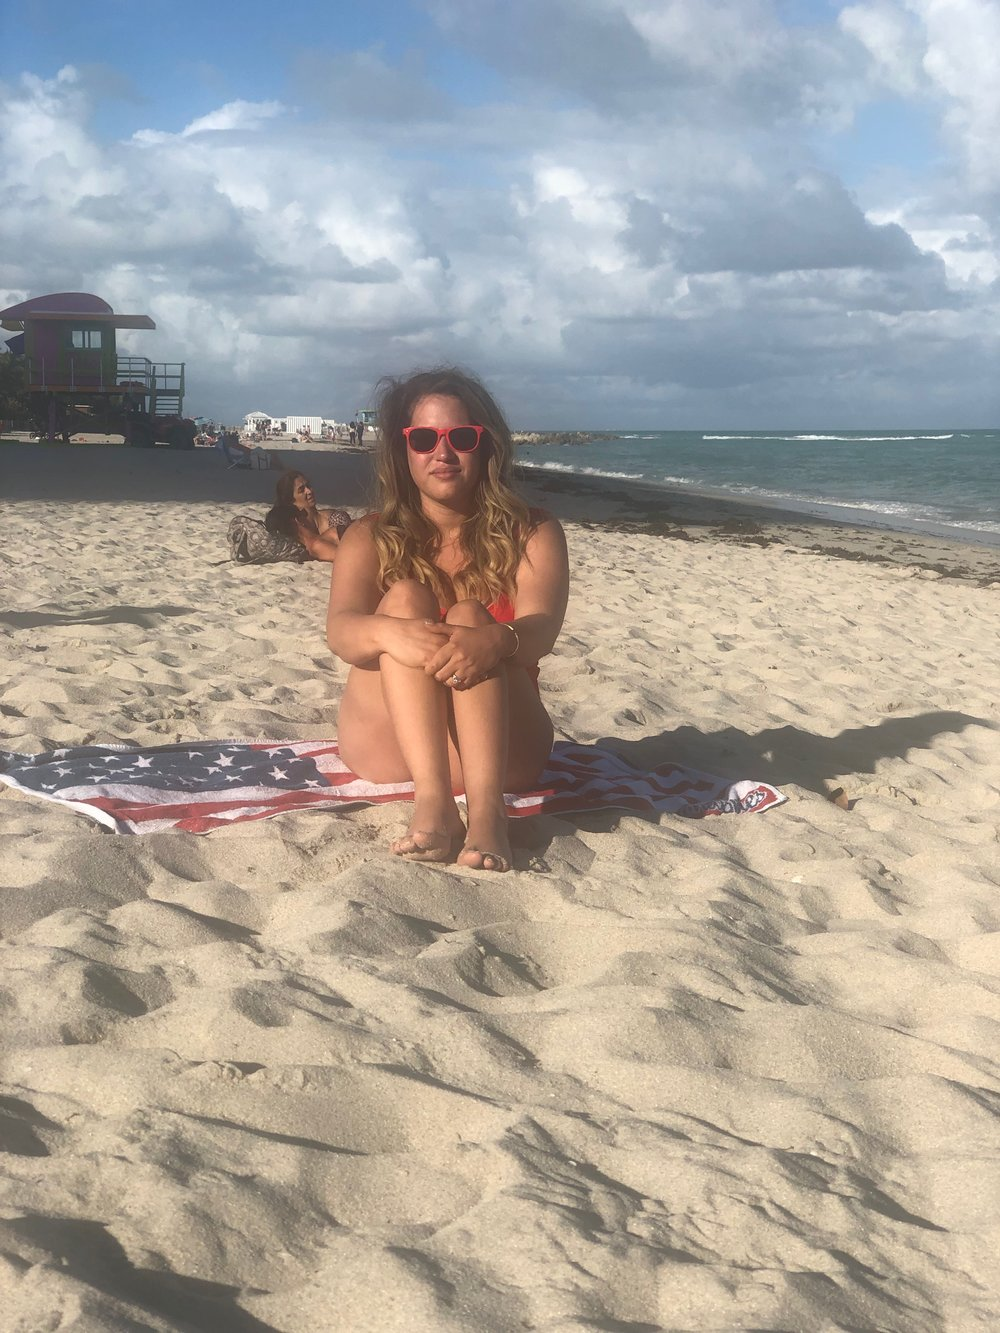 ser fotogénica en la playa